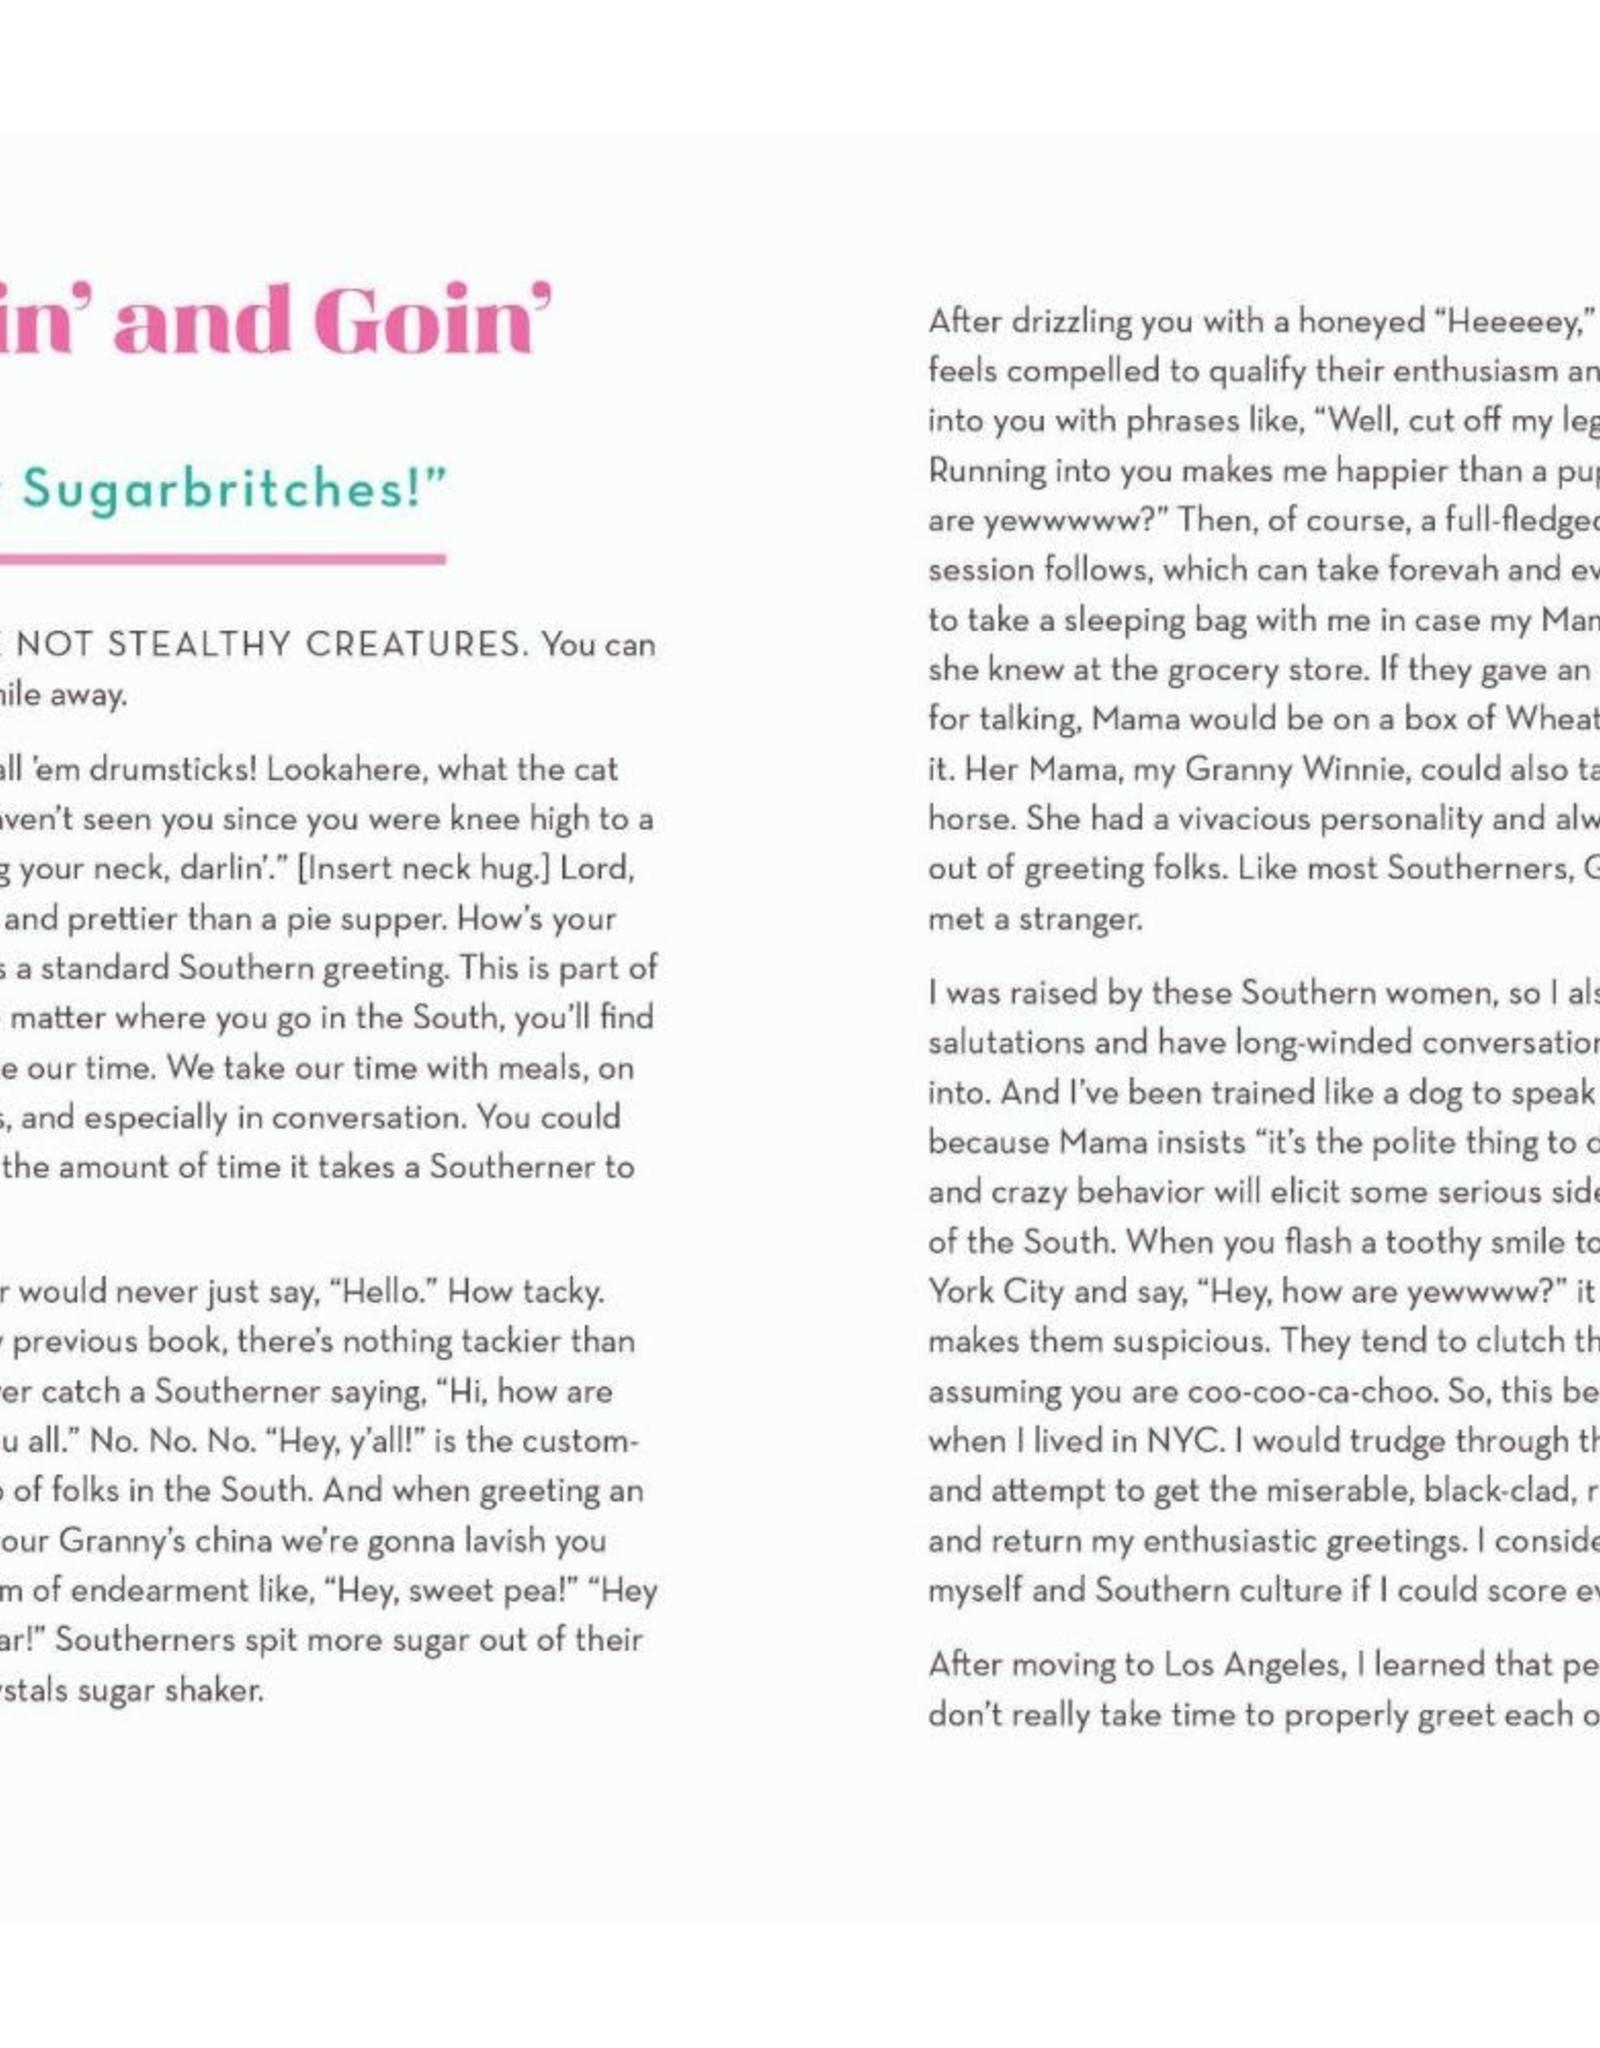 Gibbs Smith Book - Embrace Your Southern, Sugar!